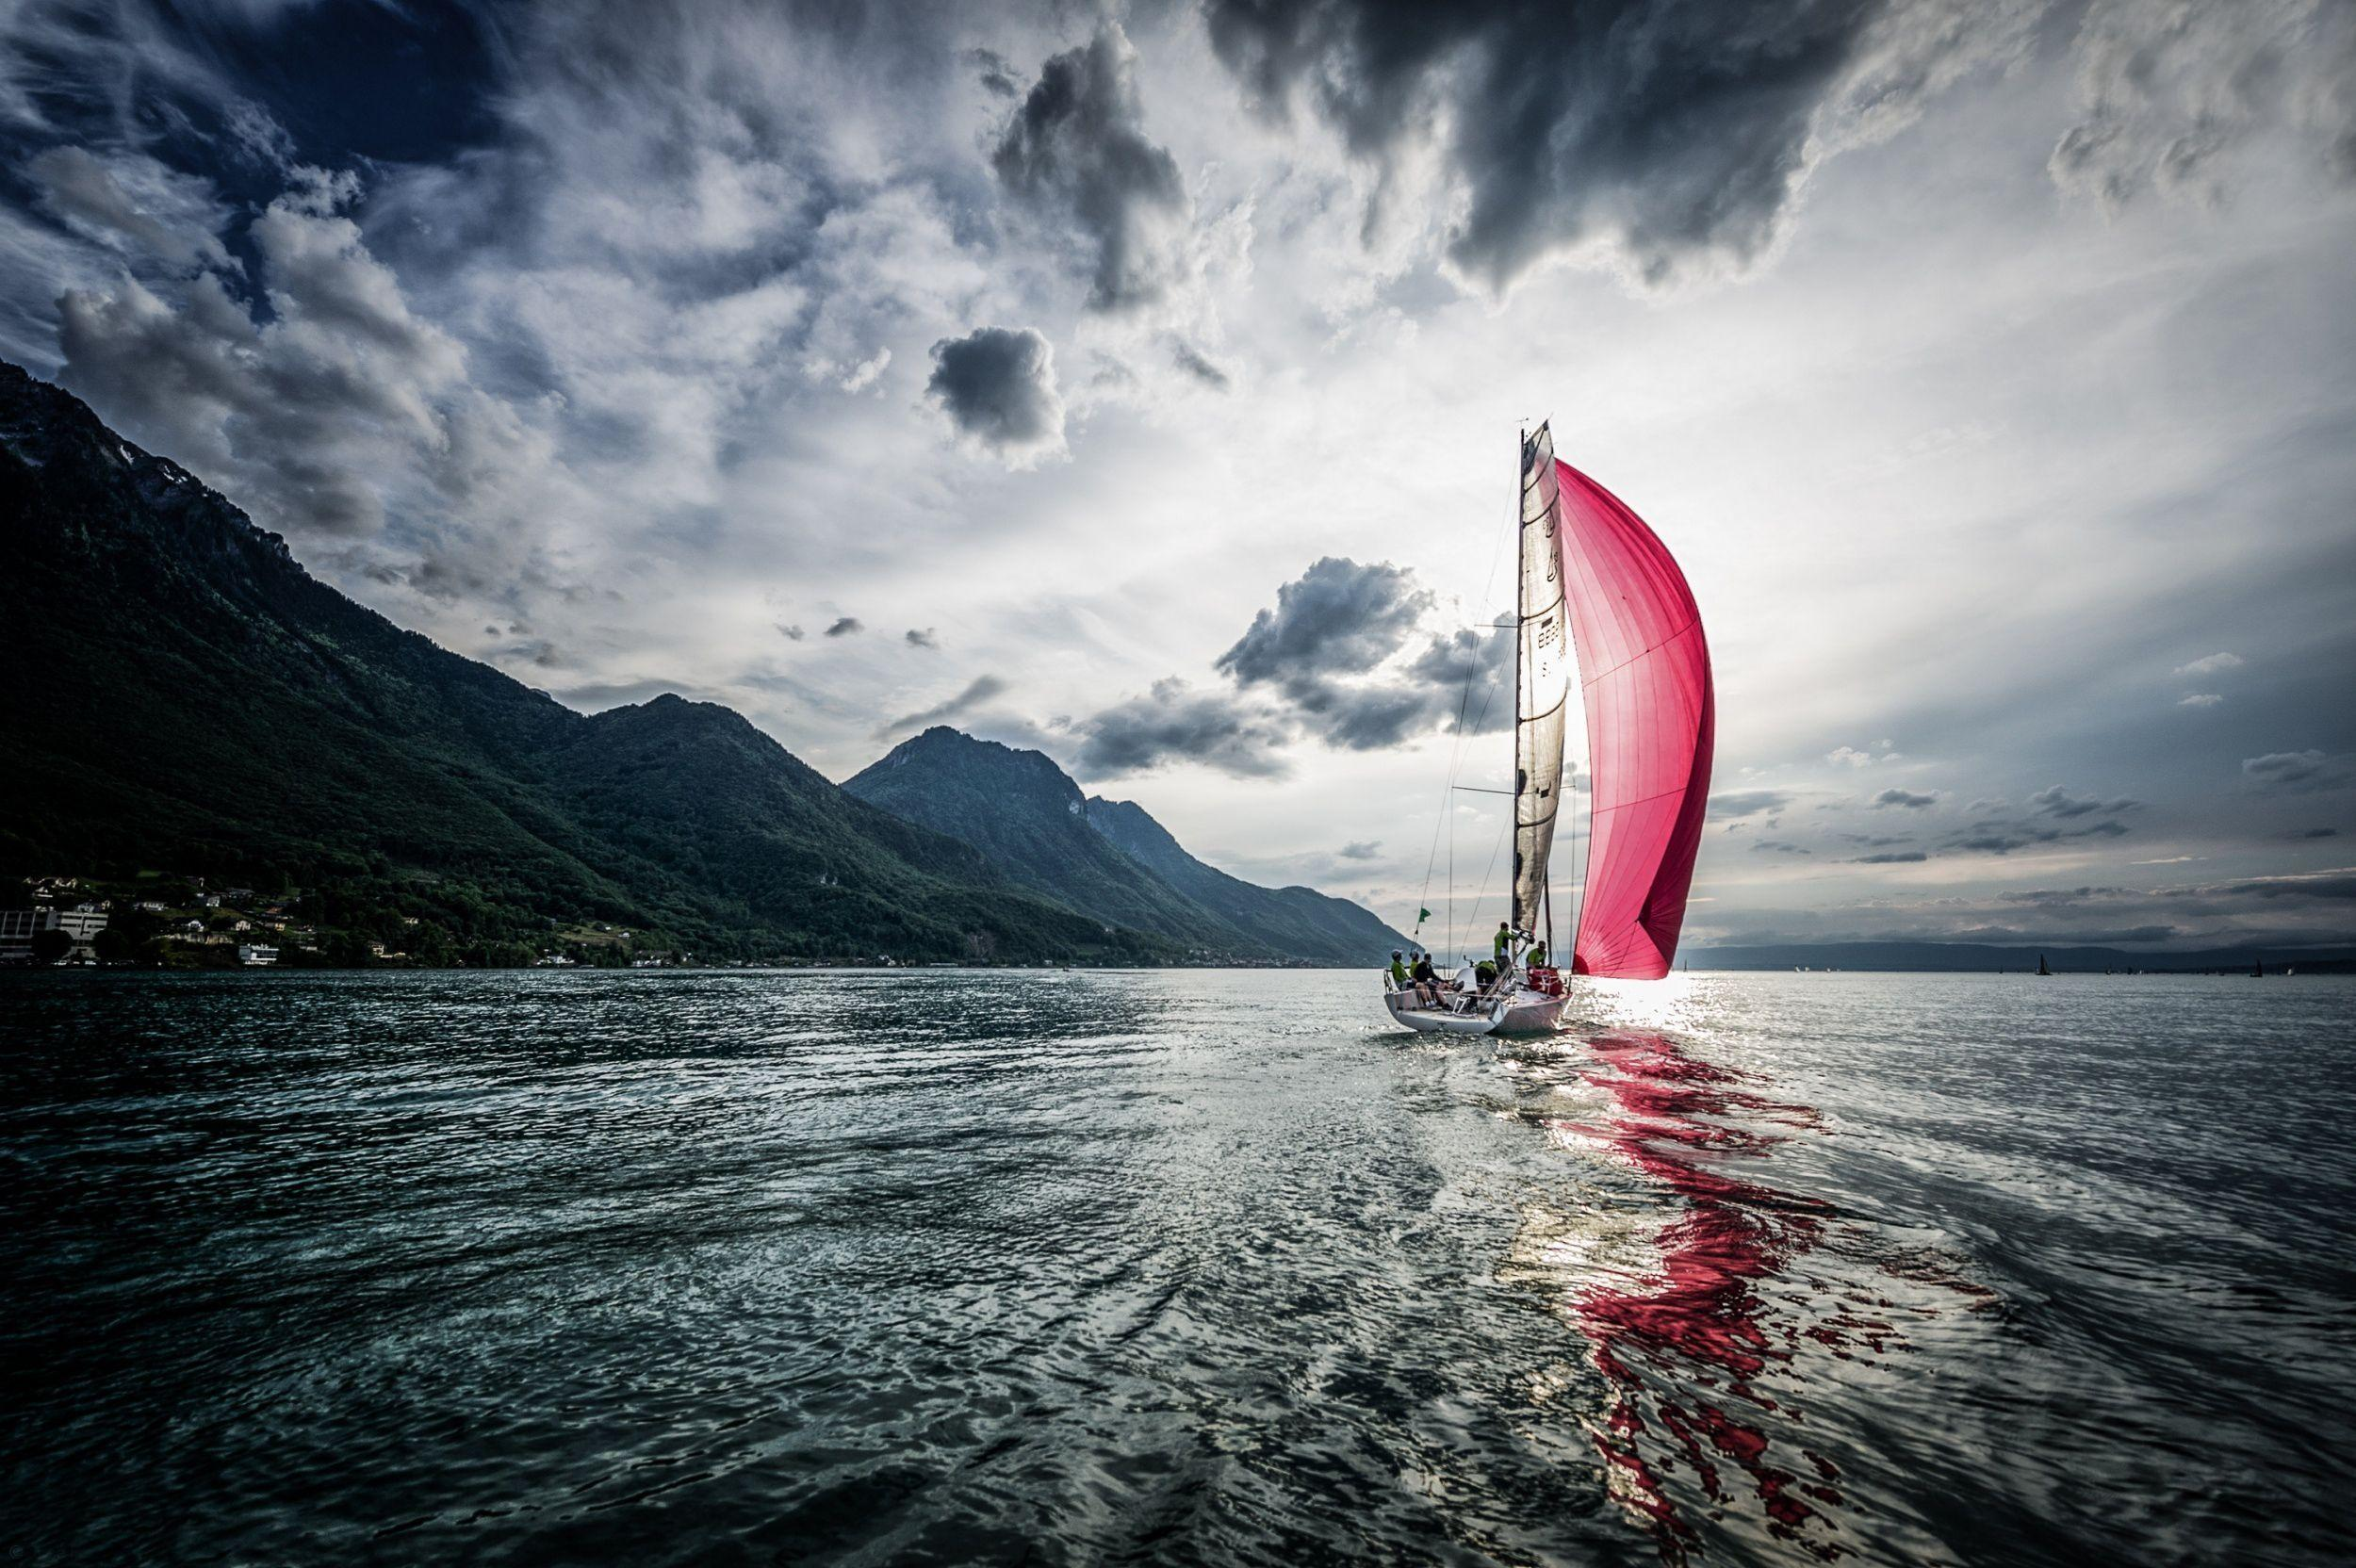 Sailing Wallpapers Top Free Sailing Backgrounds Wallpaperaccess